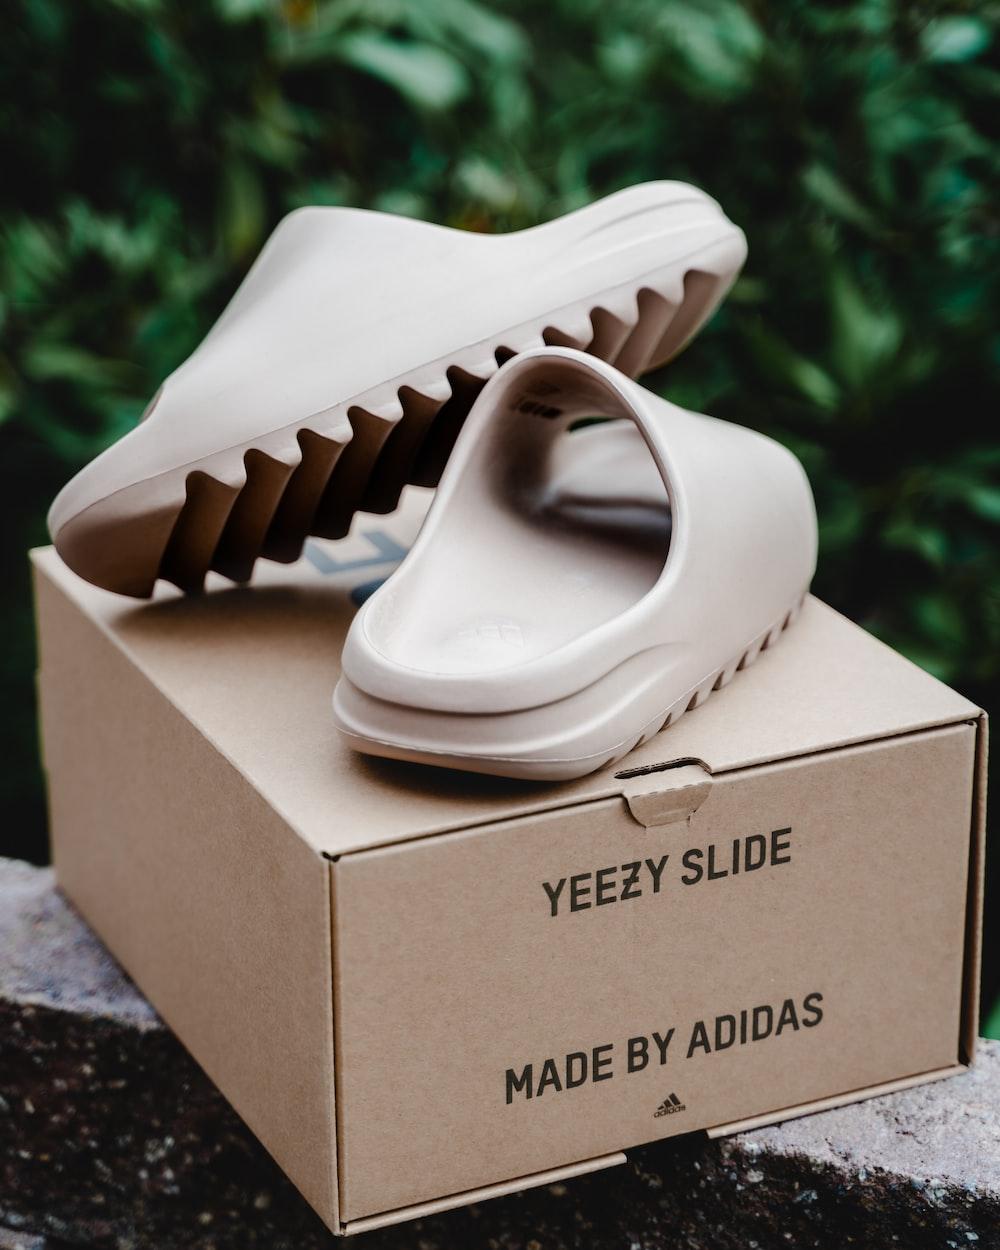 white ceramic shoe on brown cardboard box